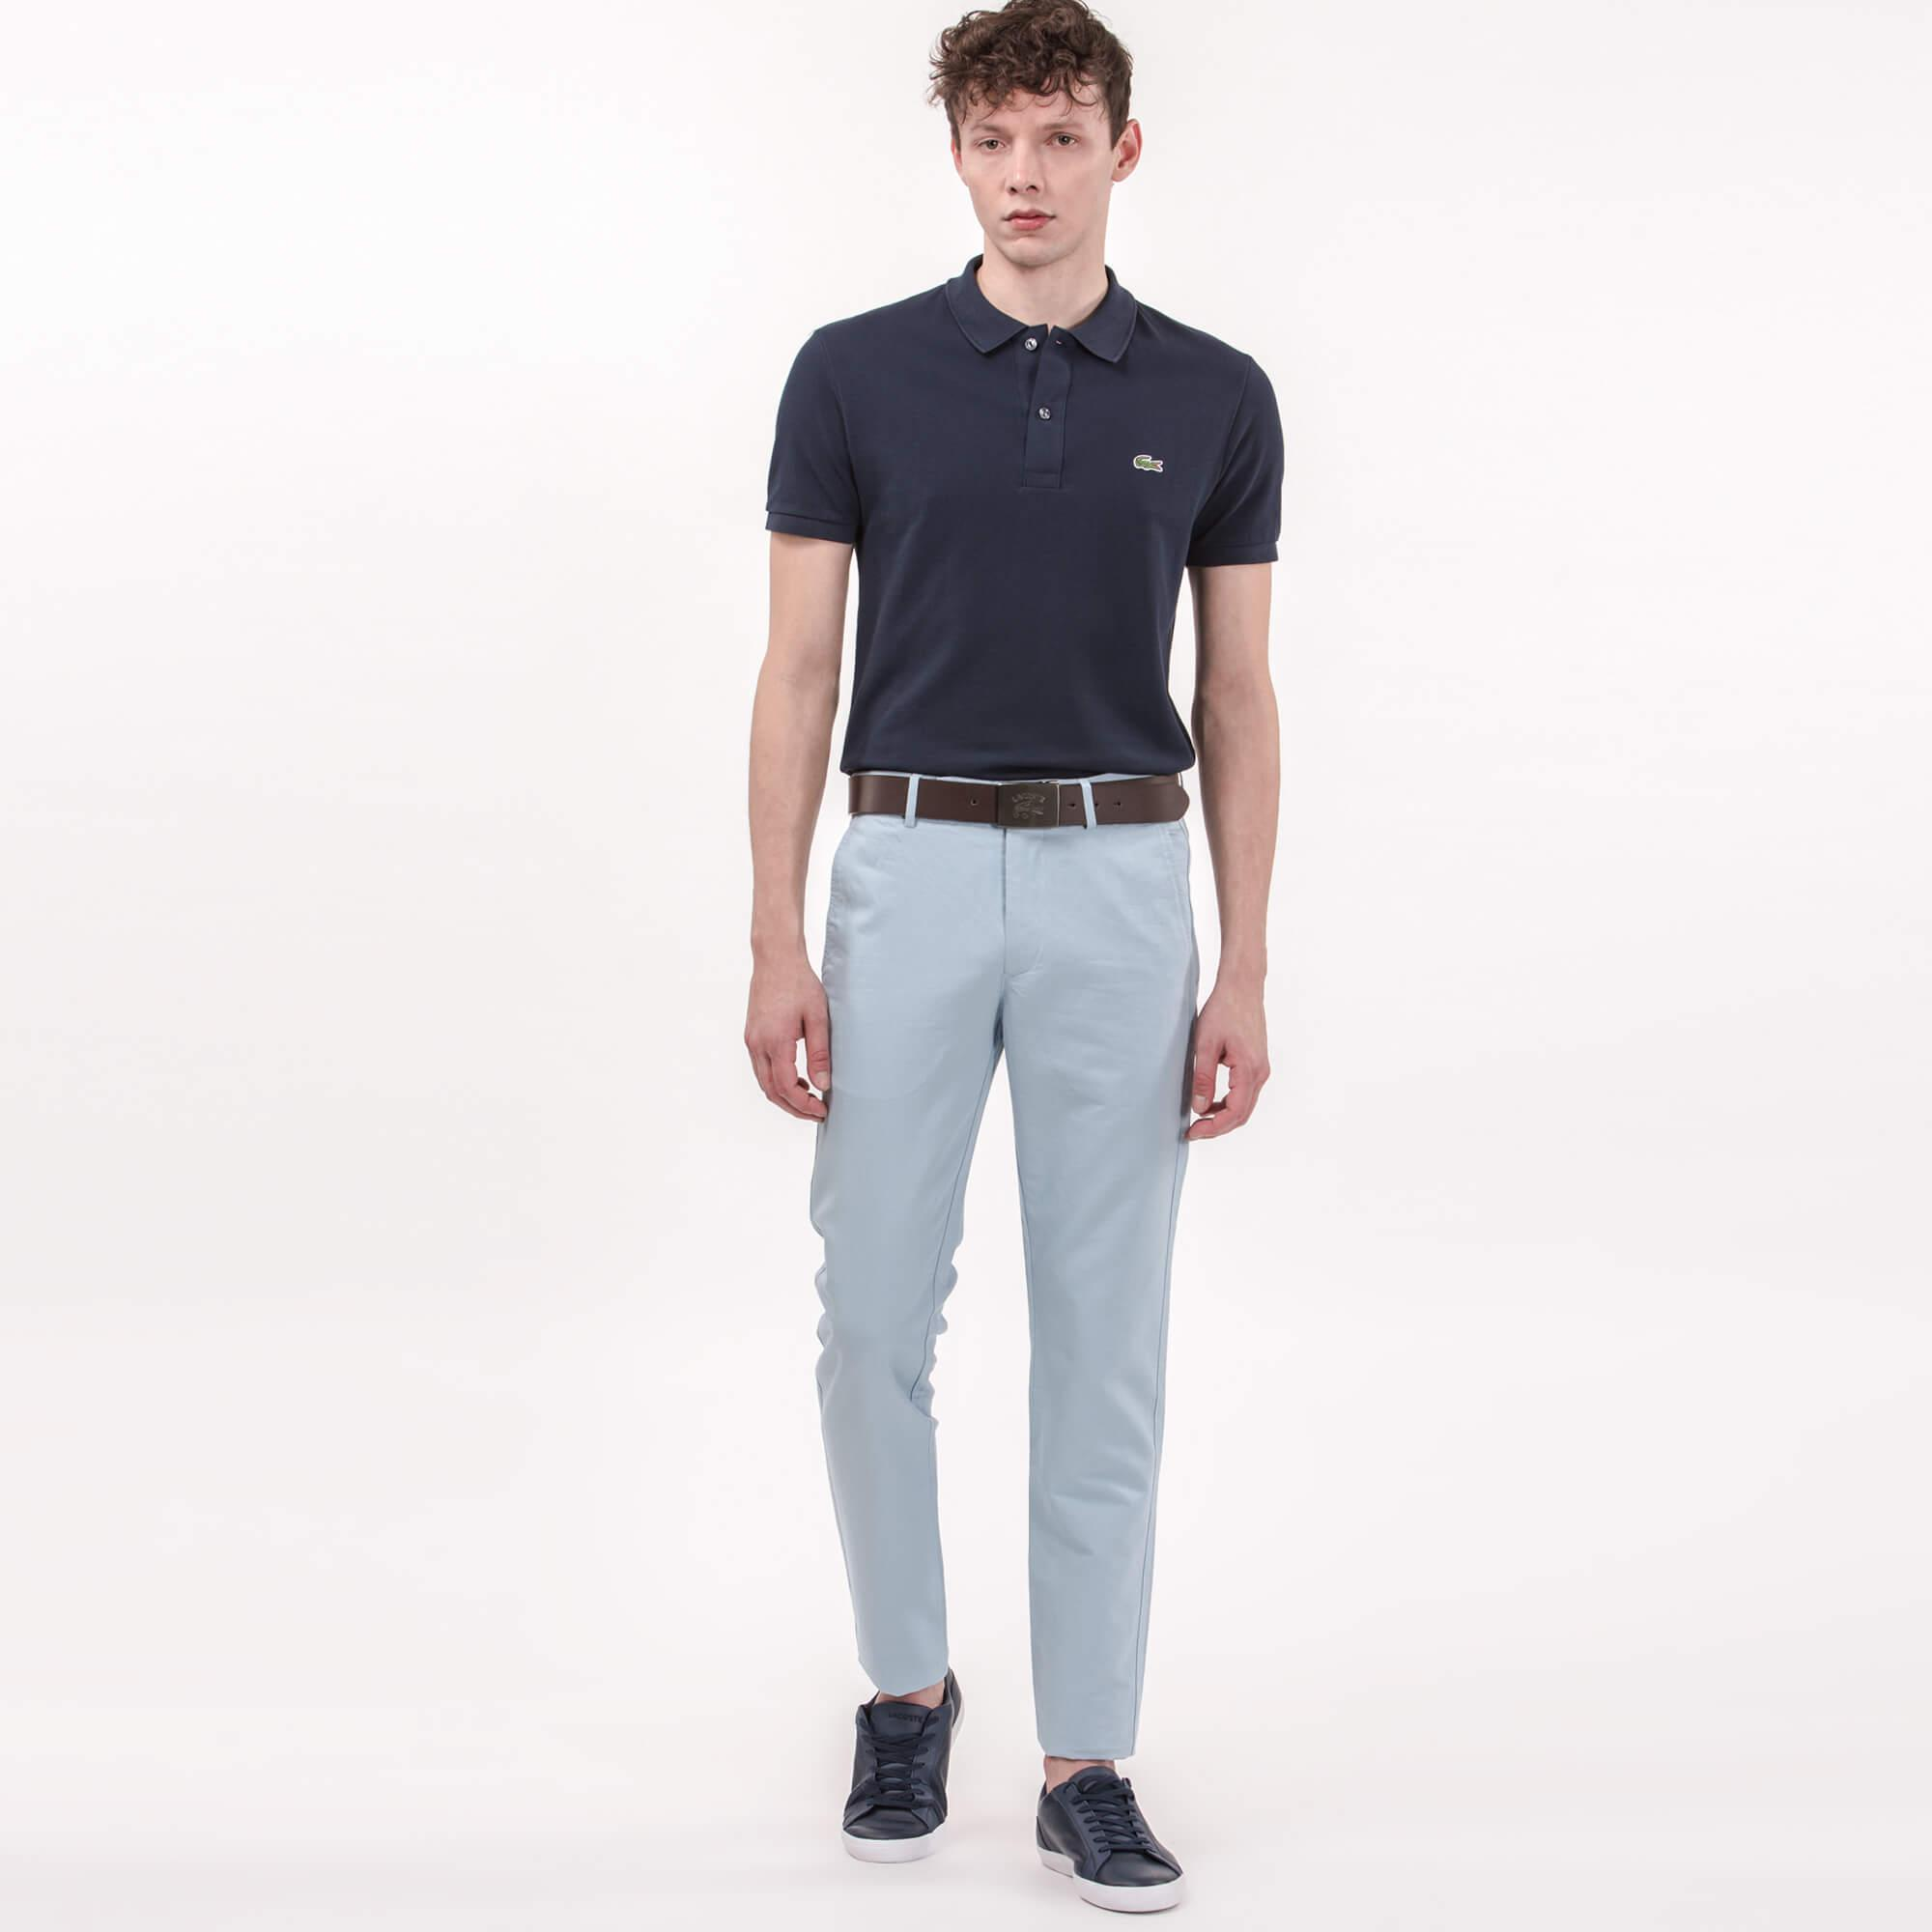 Lacoste Erkek Açık Mavi Pantolon